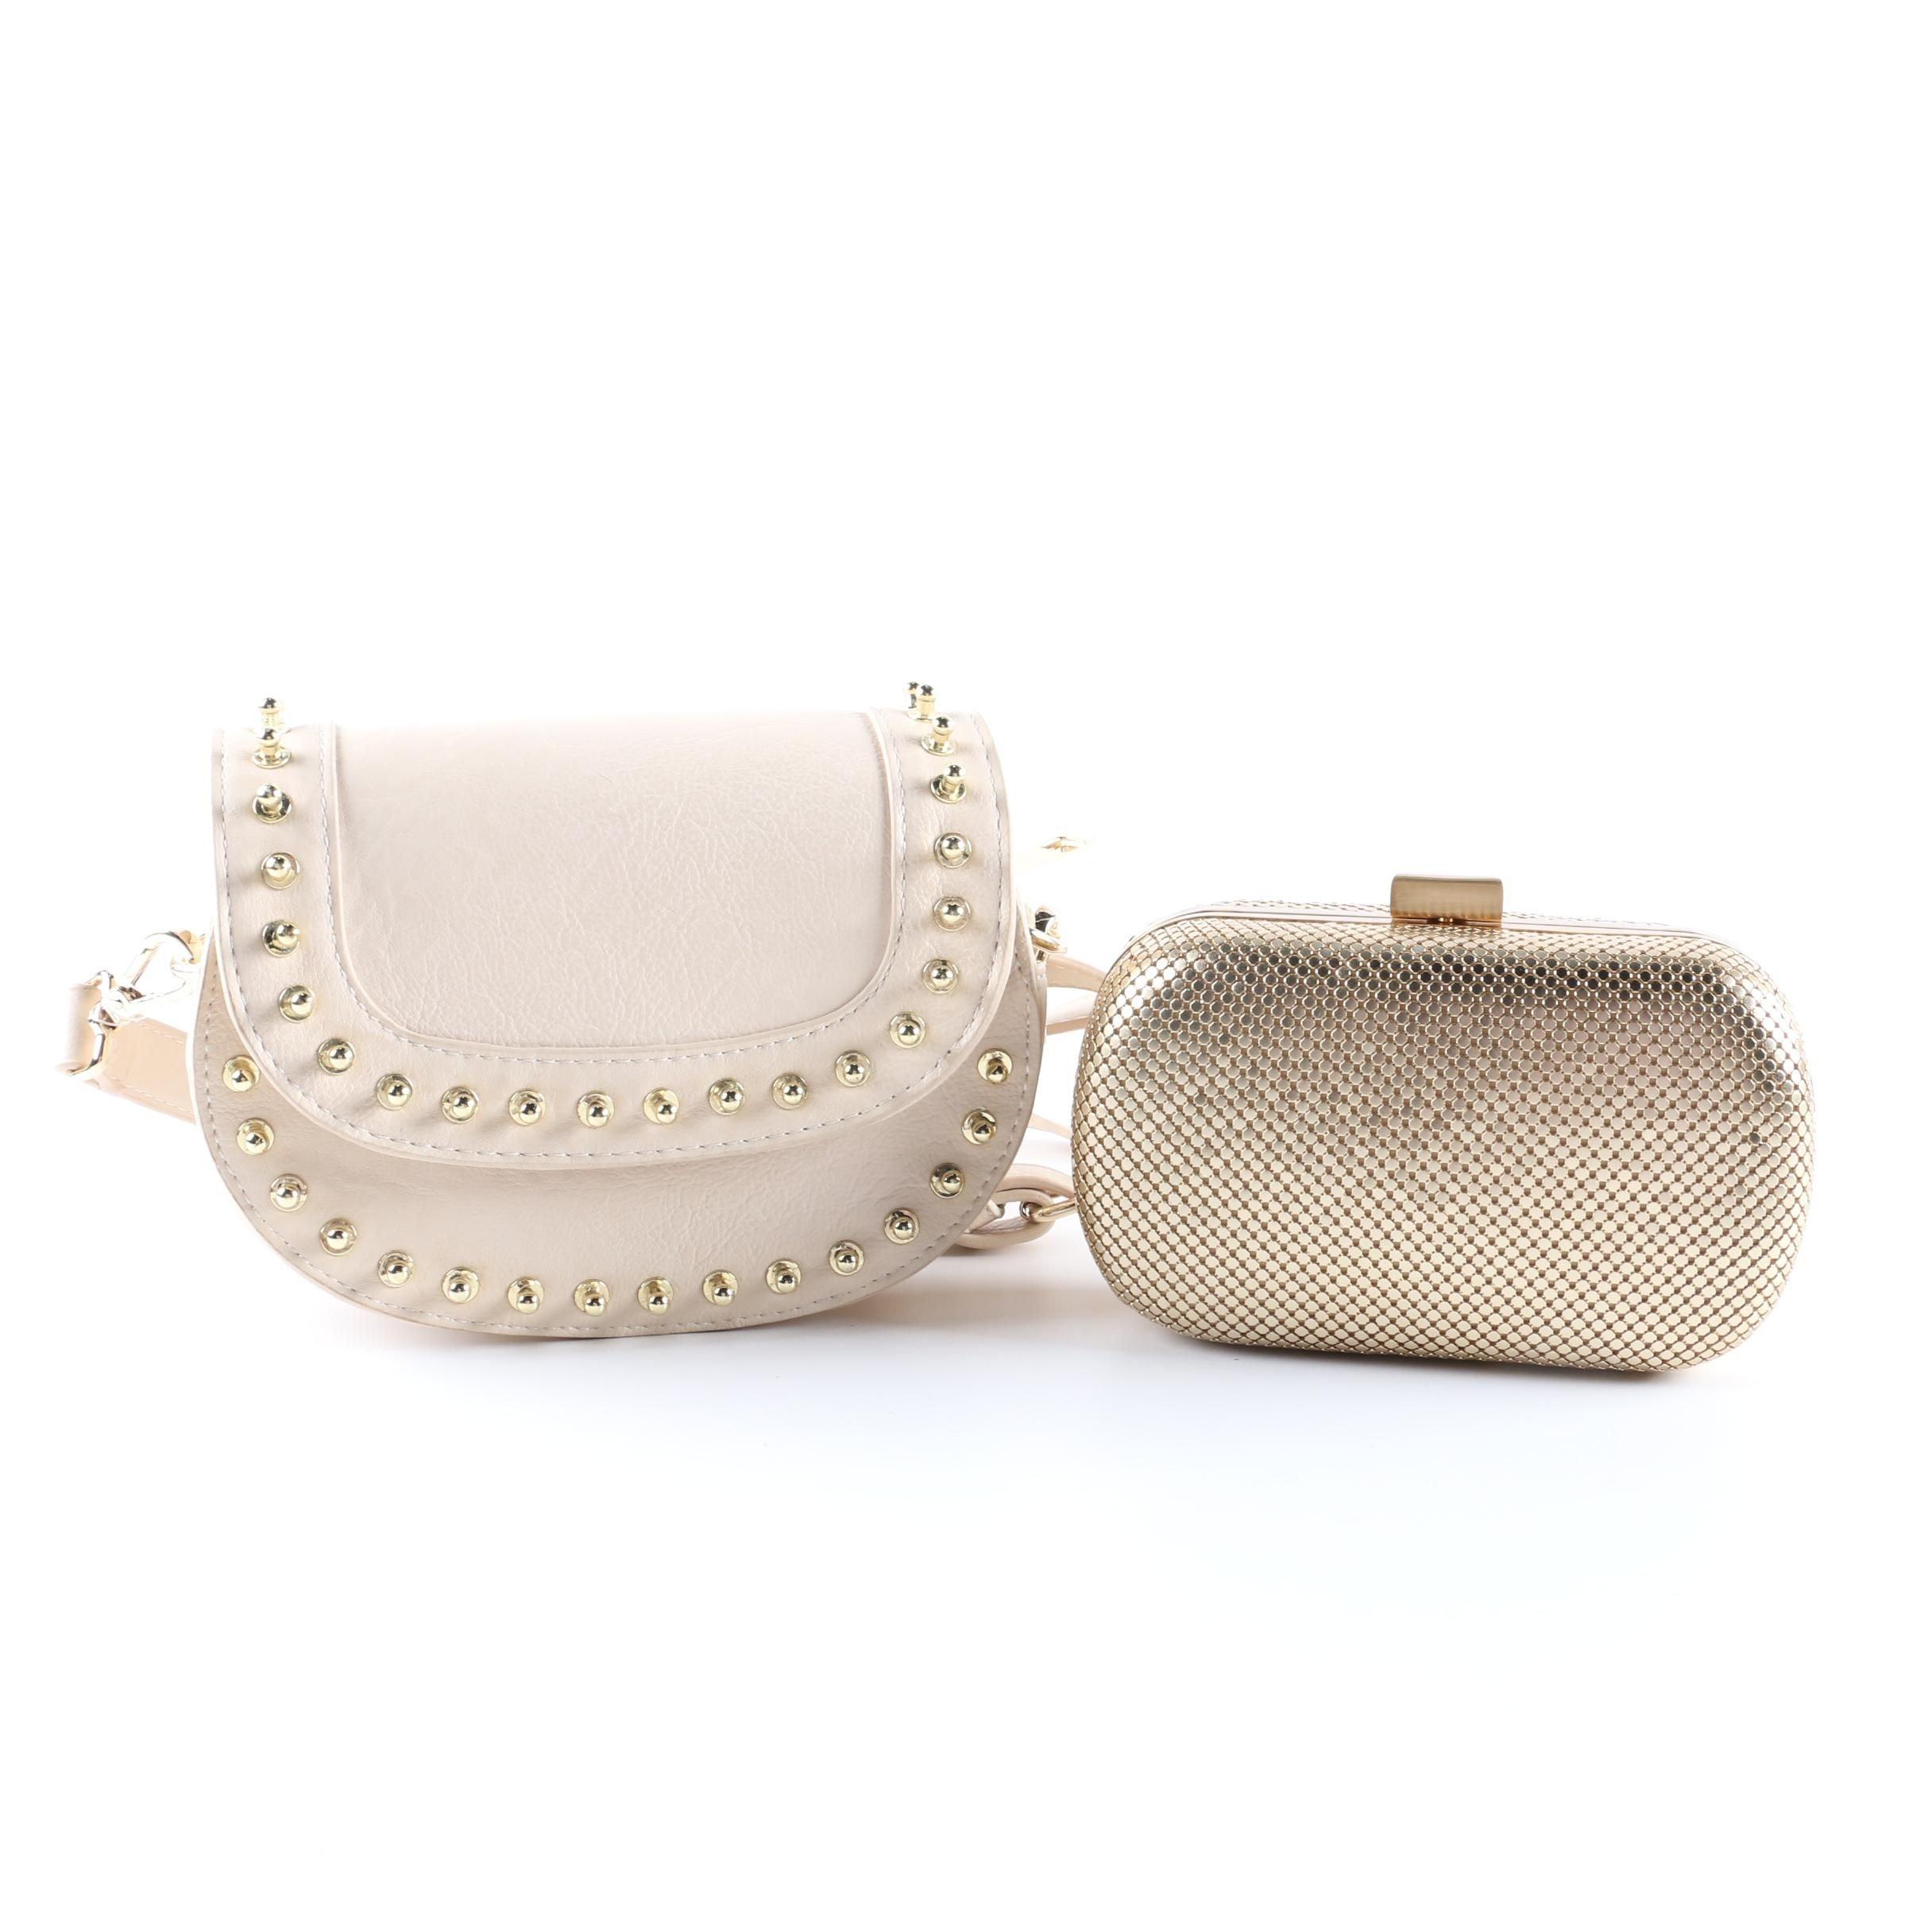 Big Buddha Handbag And Whiting Davis Gold Tone Mesh Minaudiere Ebth